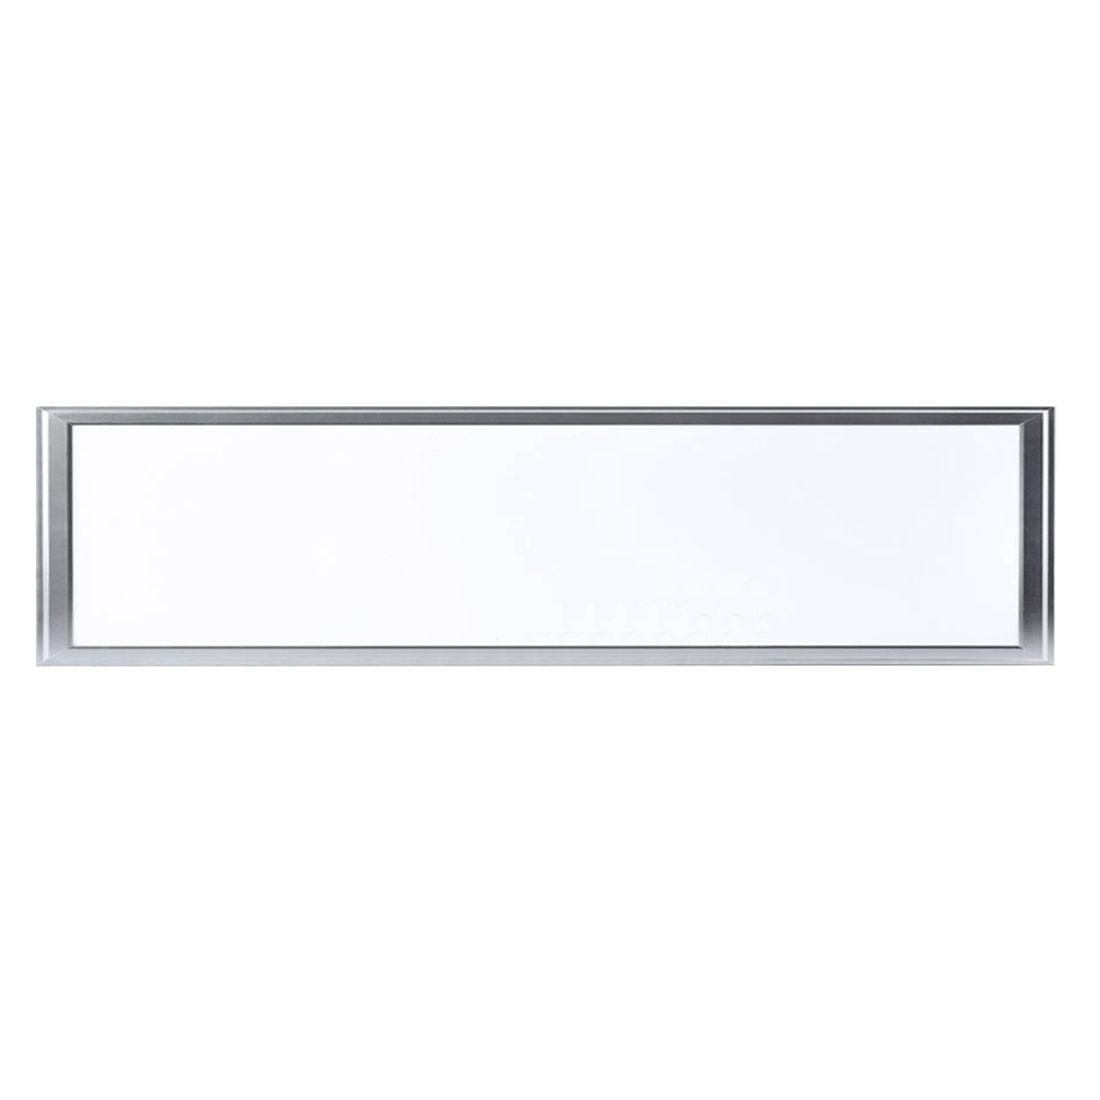 120X30cm LED Panel Light 36W Warm White(2800K) Square Recessed Lamp Pendant Lights SMD 2835 Thin Ultraslim Square LED Light Set<br>